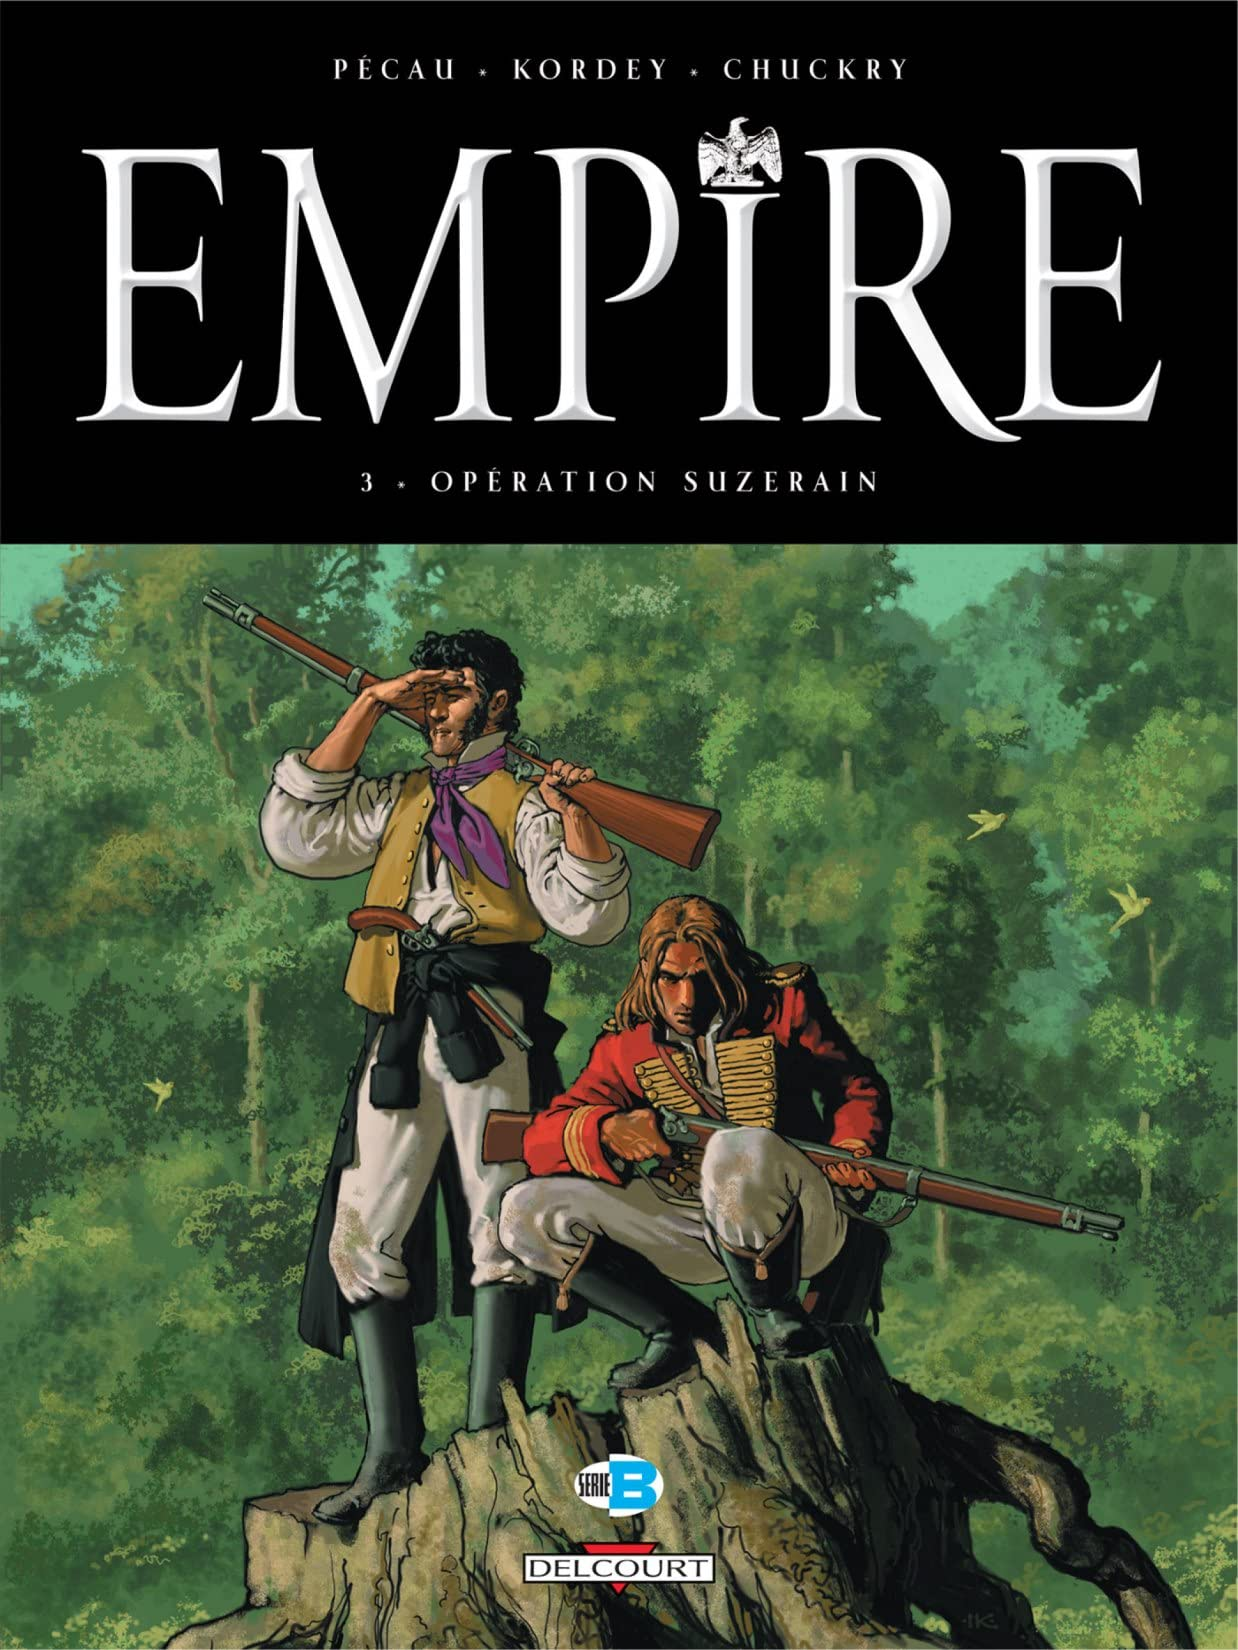 Empire Vol. 3: Opération Suzerain